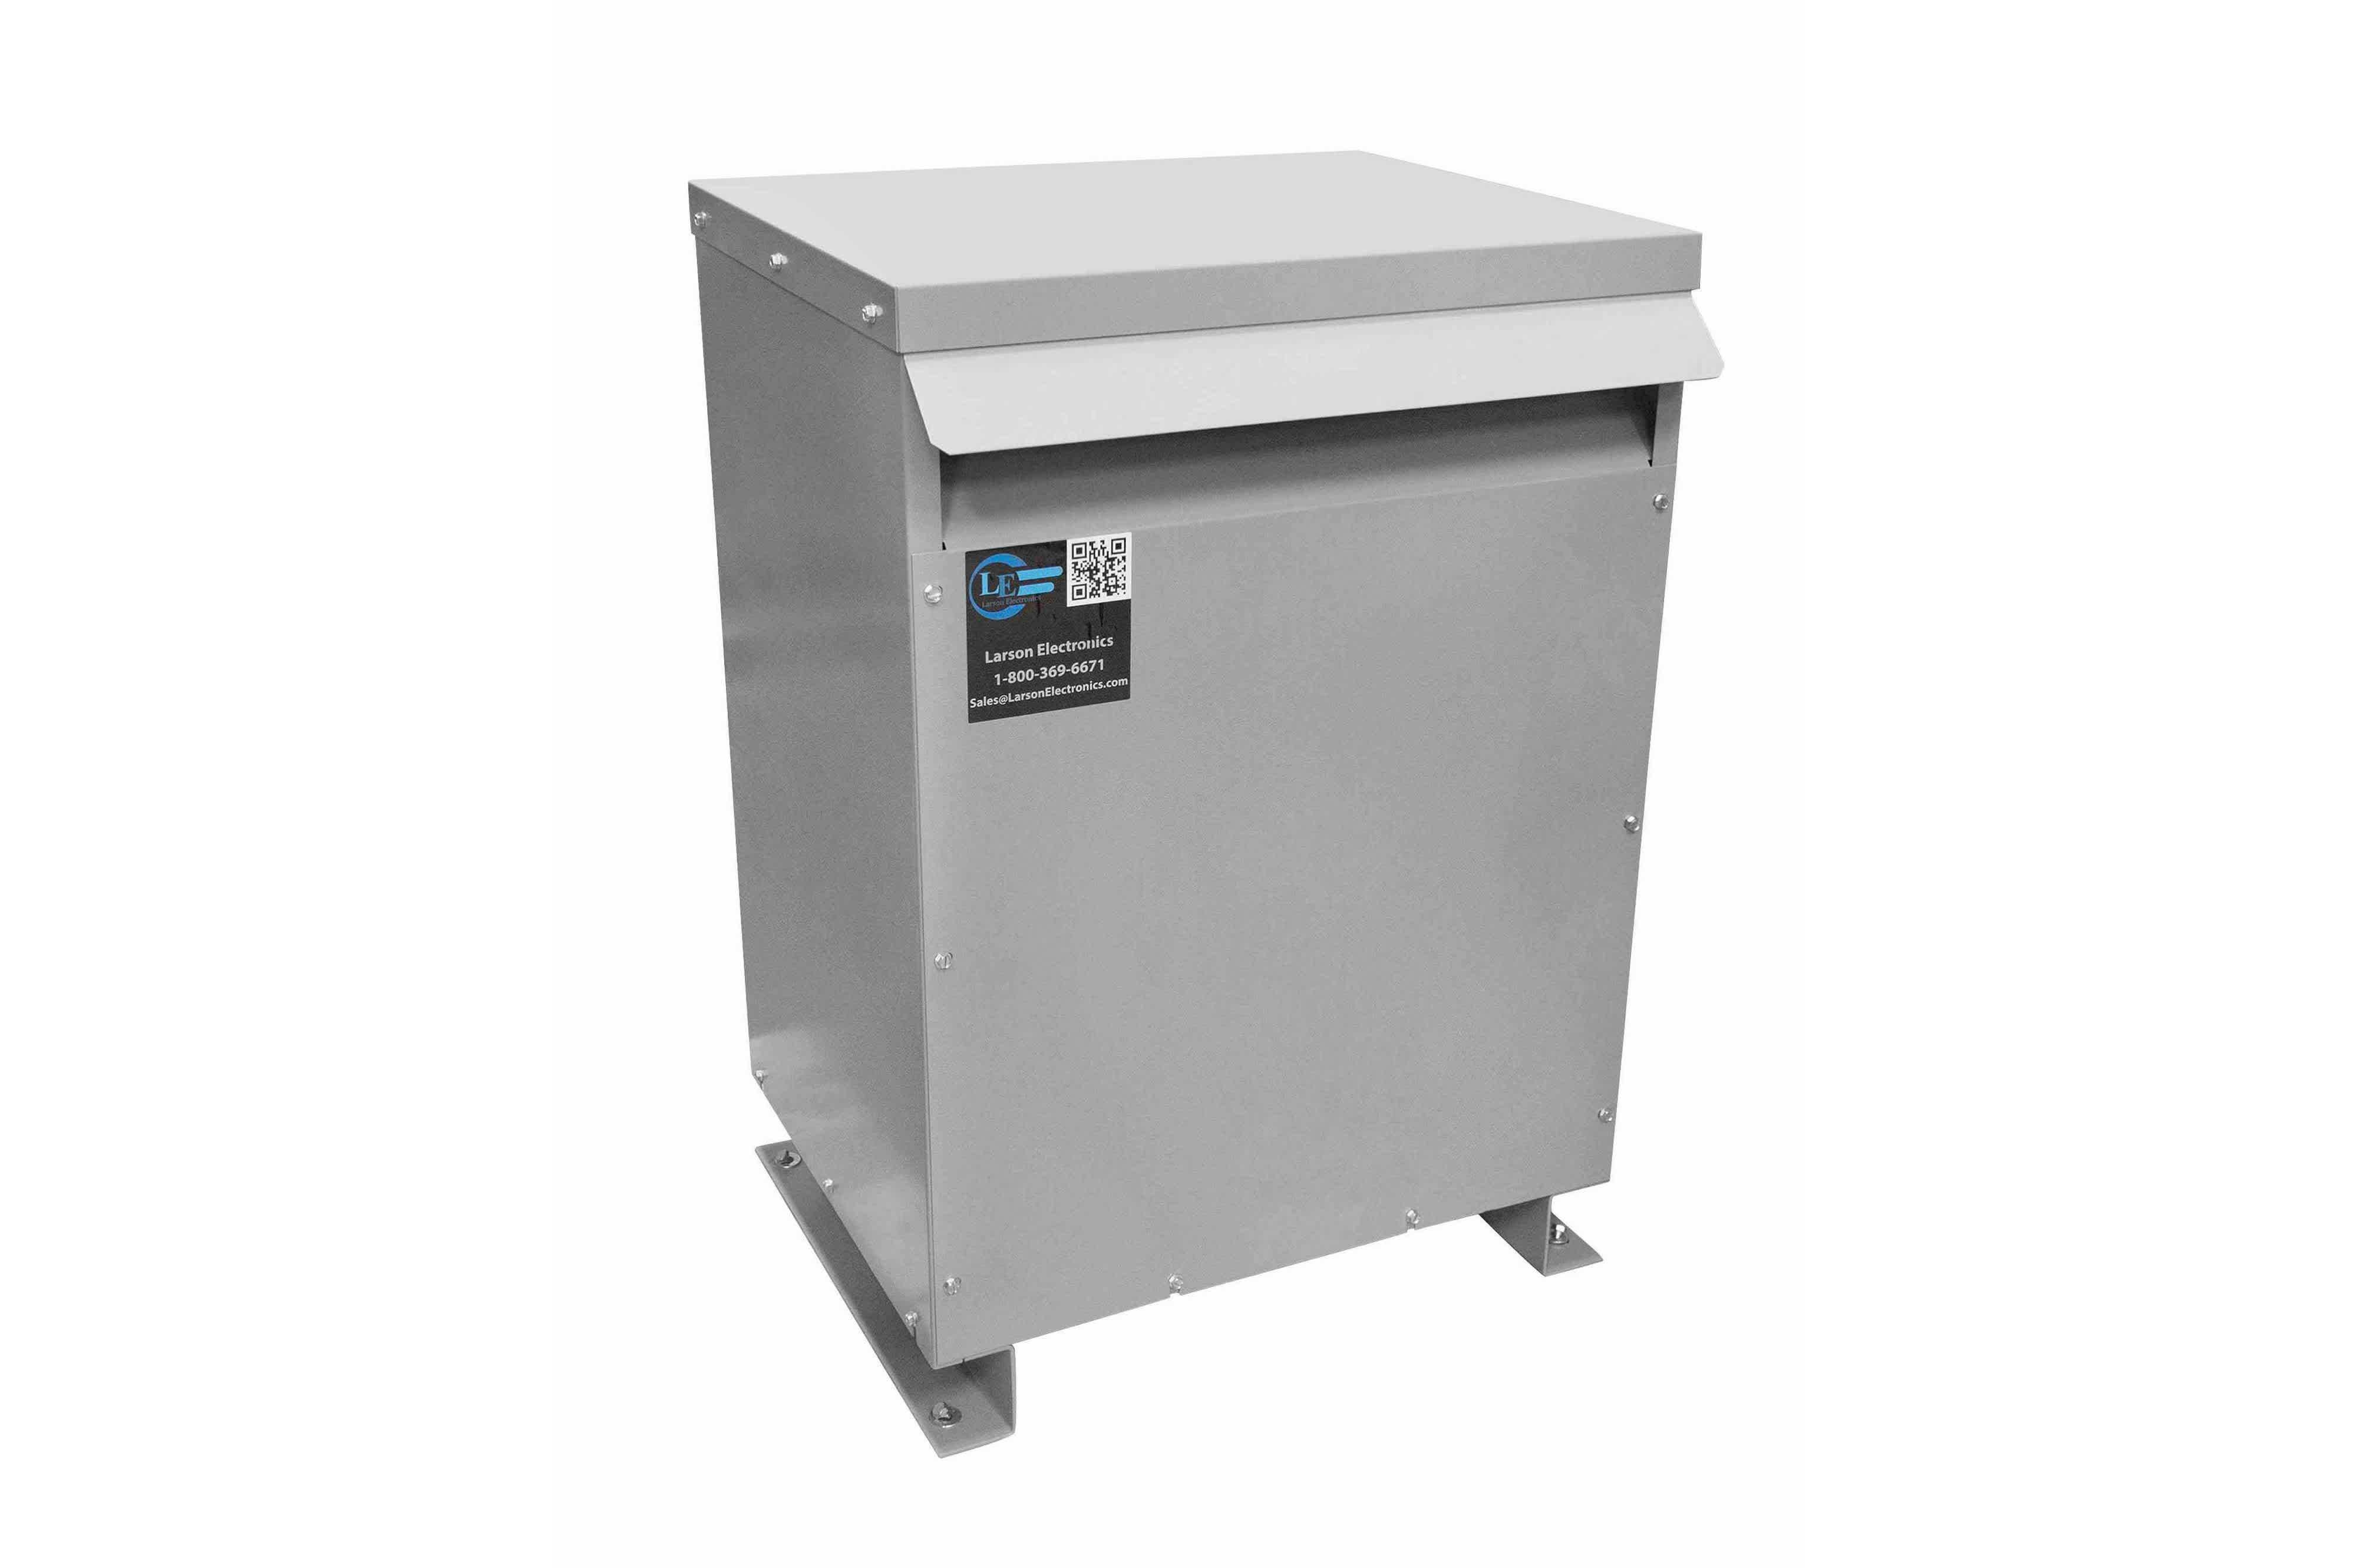 750 kVA 3PH Isolation Transformer, 460V Wye Primary, 600Y/347 Wye-N Secondary, N3R, Ventilated, 60 Hz